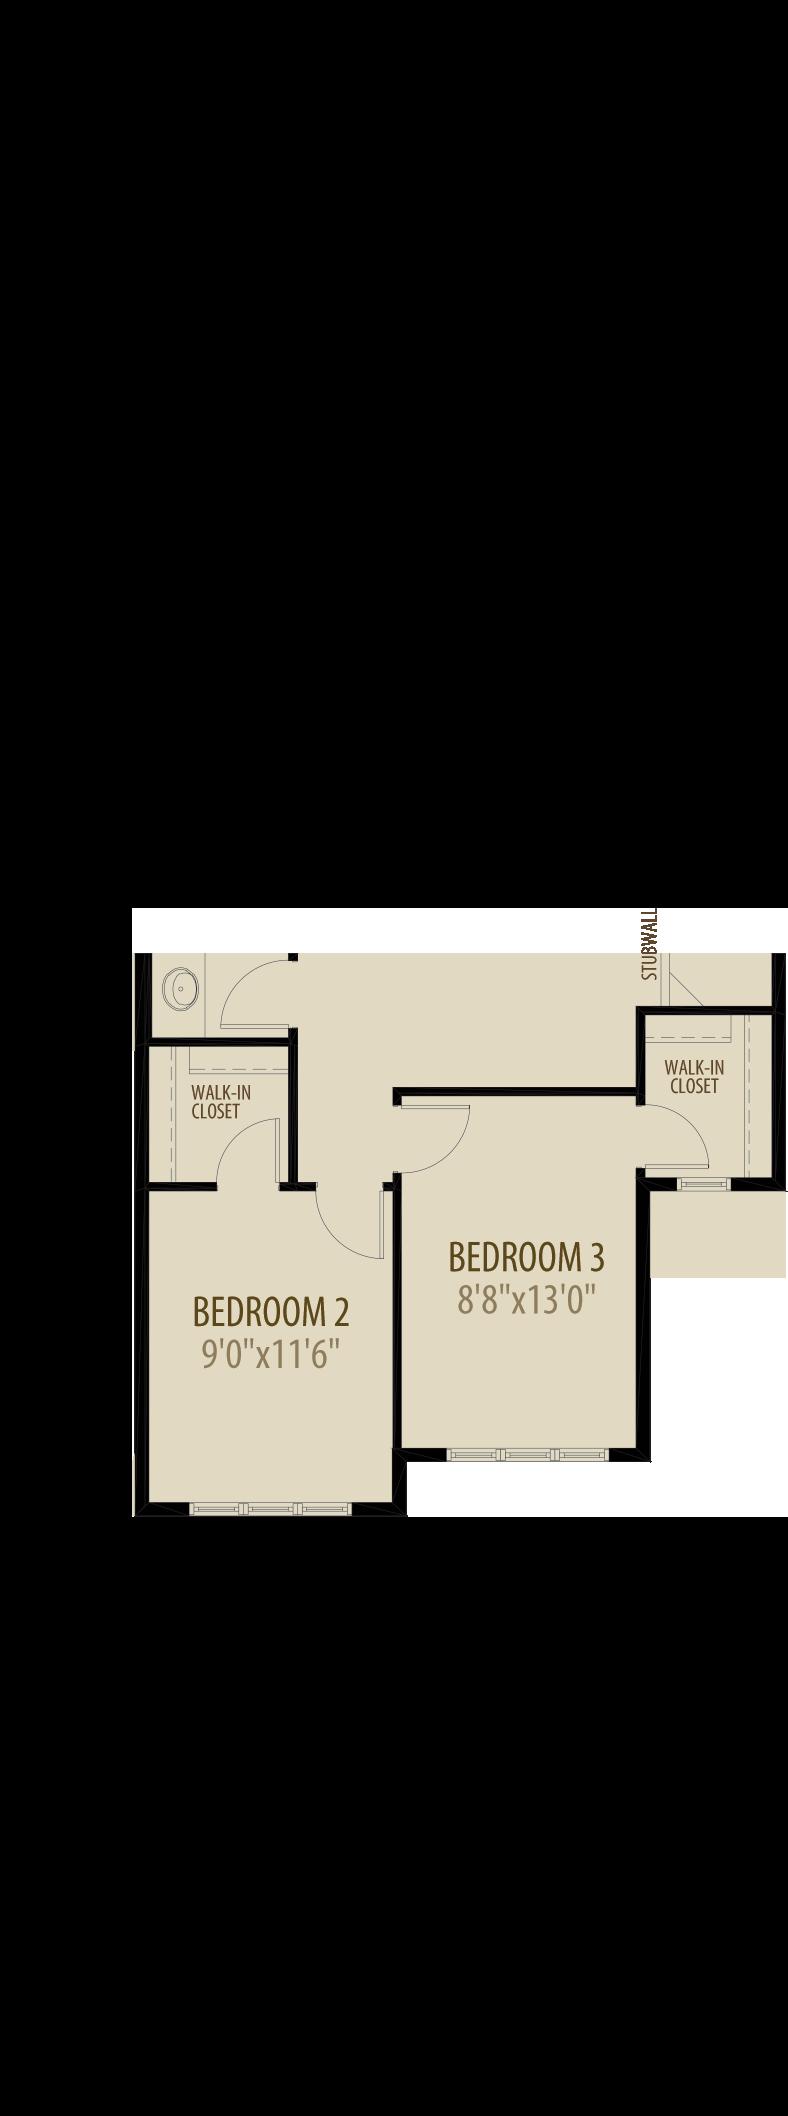 Extended Upper Floorplan adds 57 sq ft